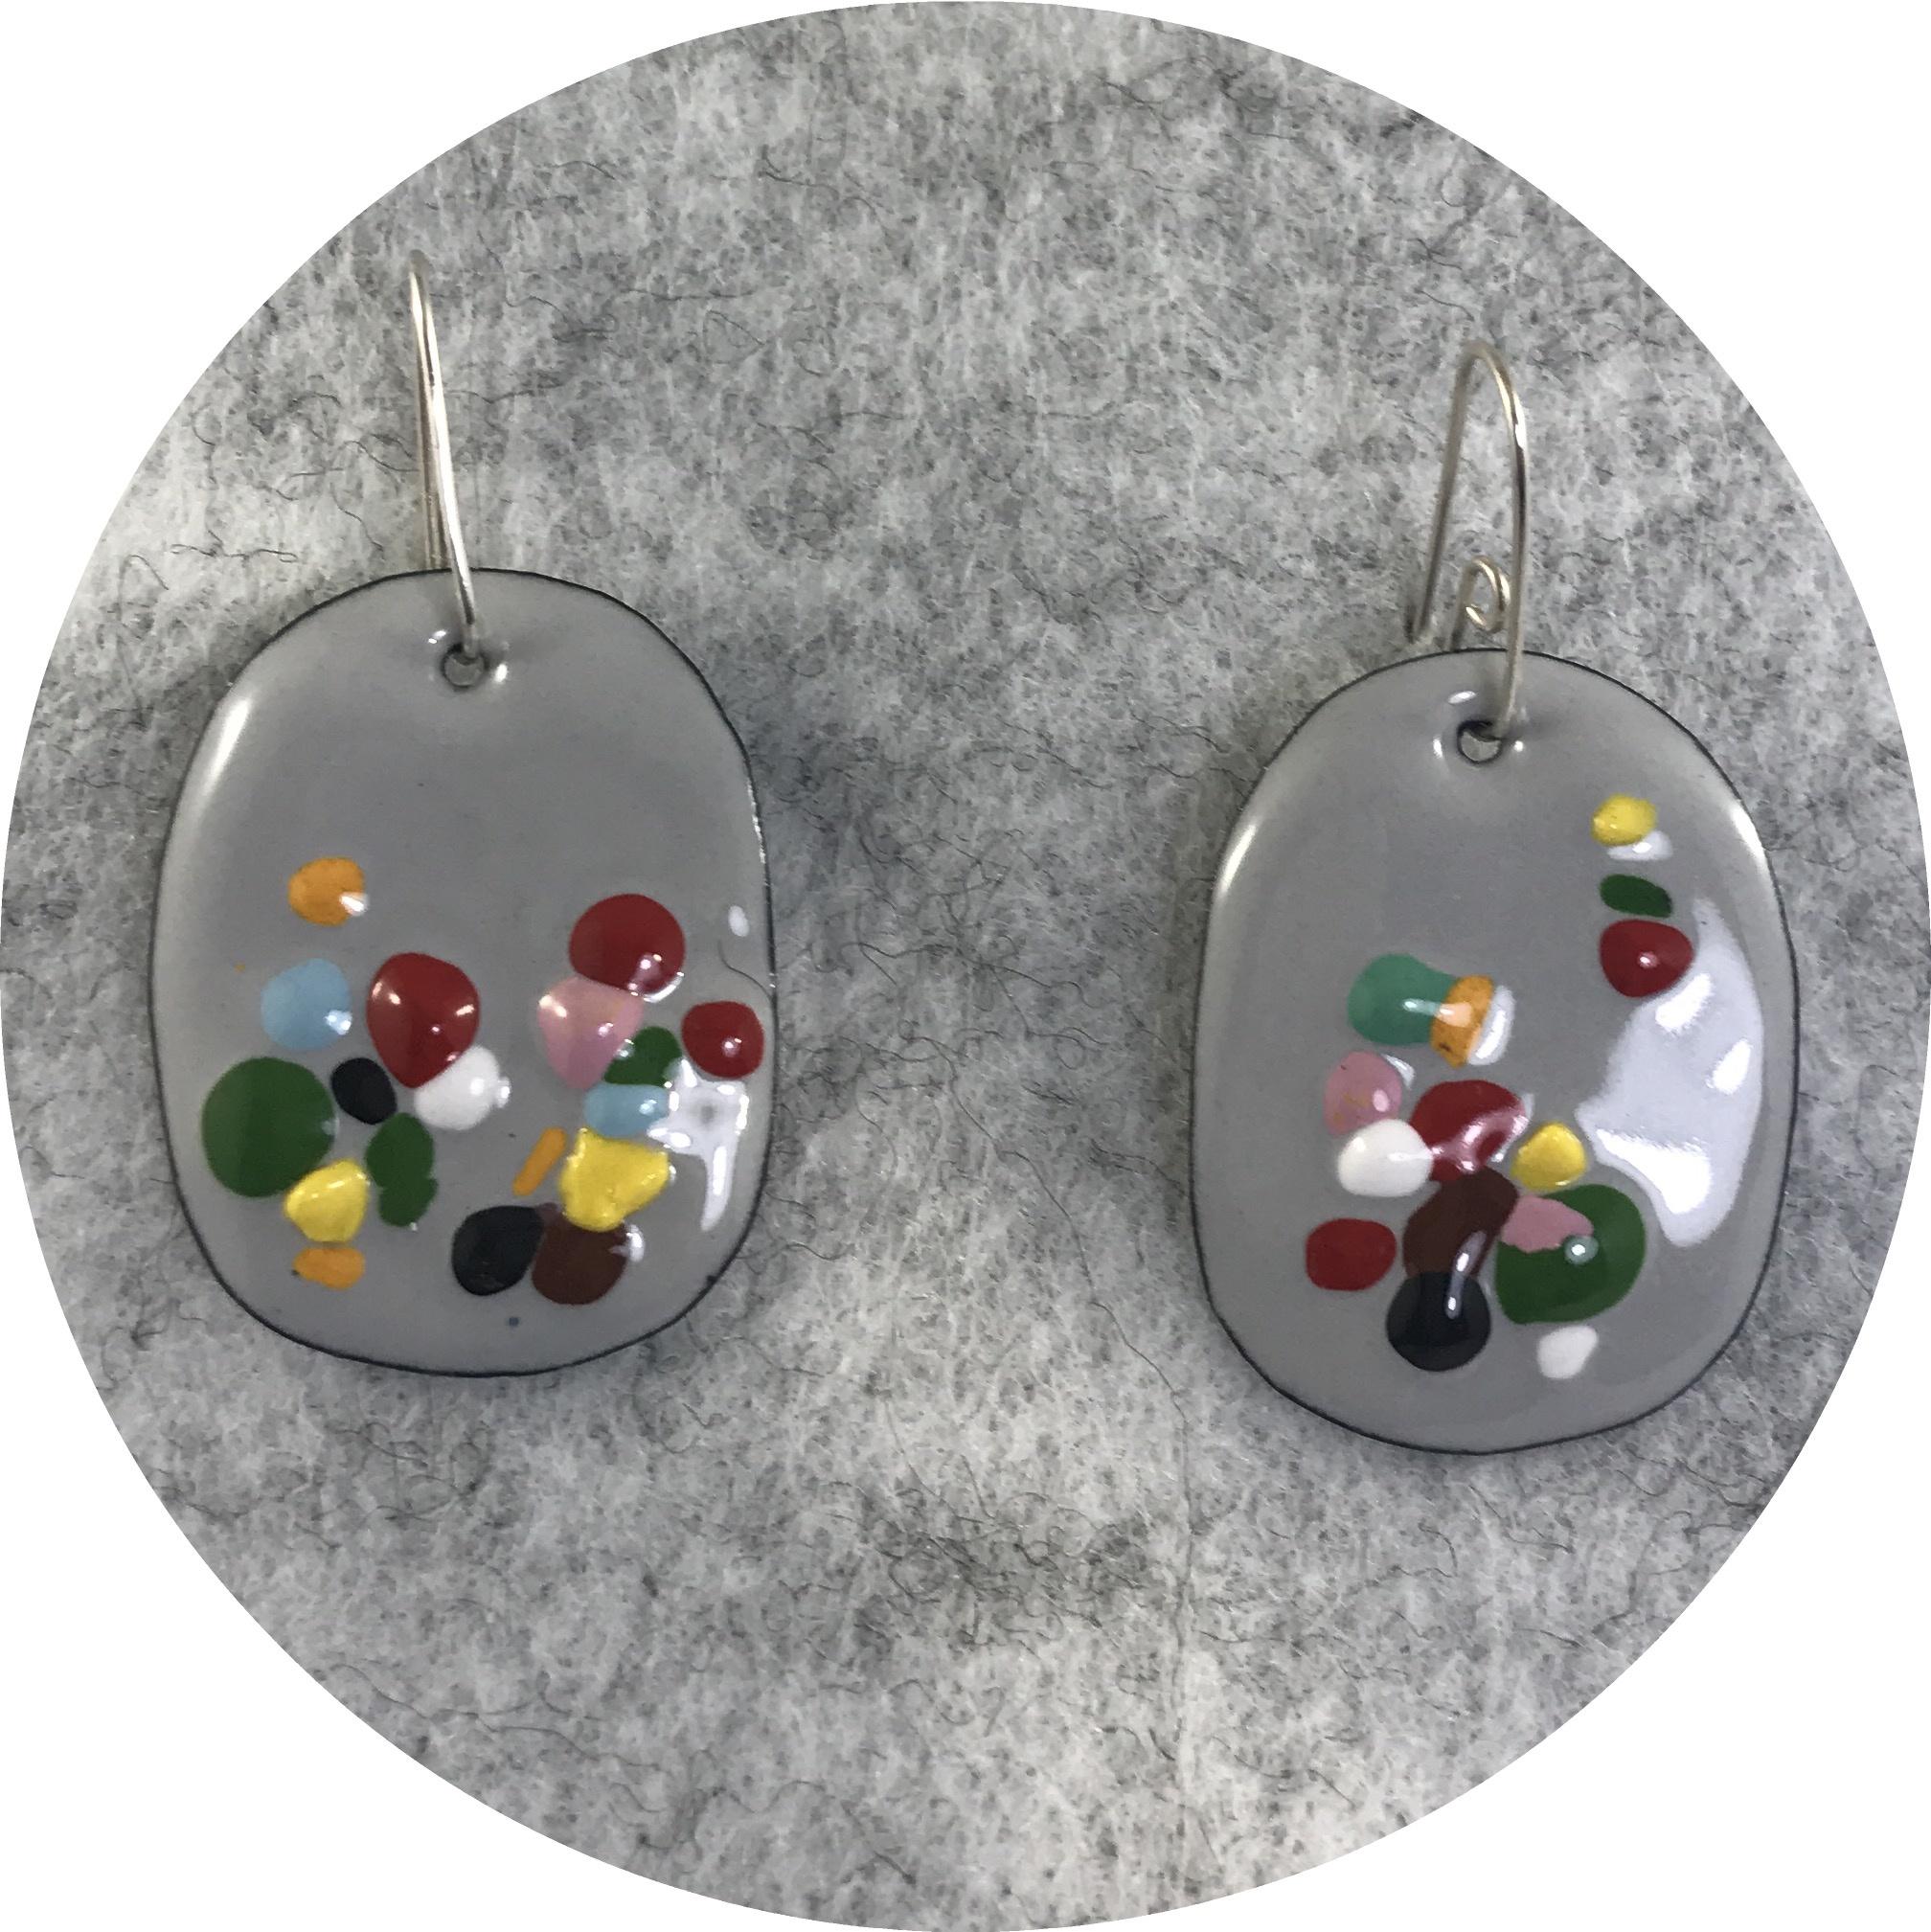 Jenna O'Brien- Queenie Grey Medium earrings. Enamel and sterling silver.